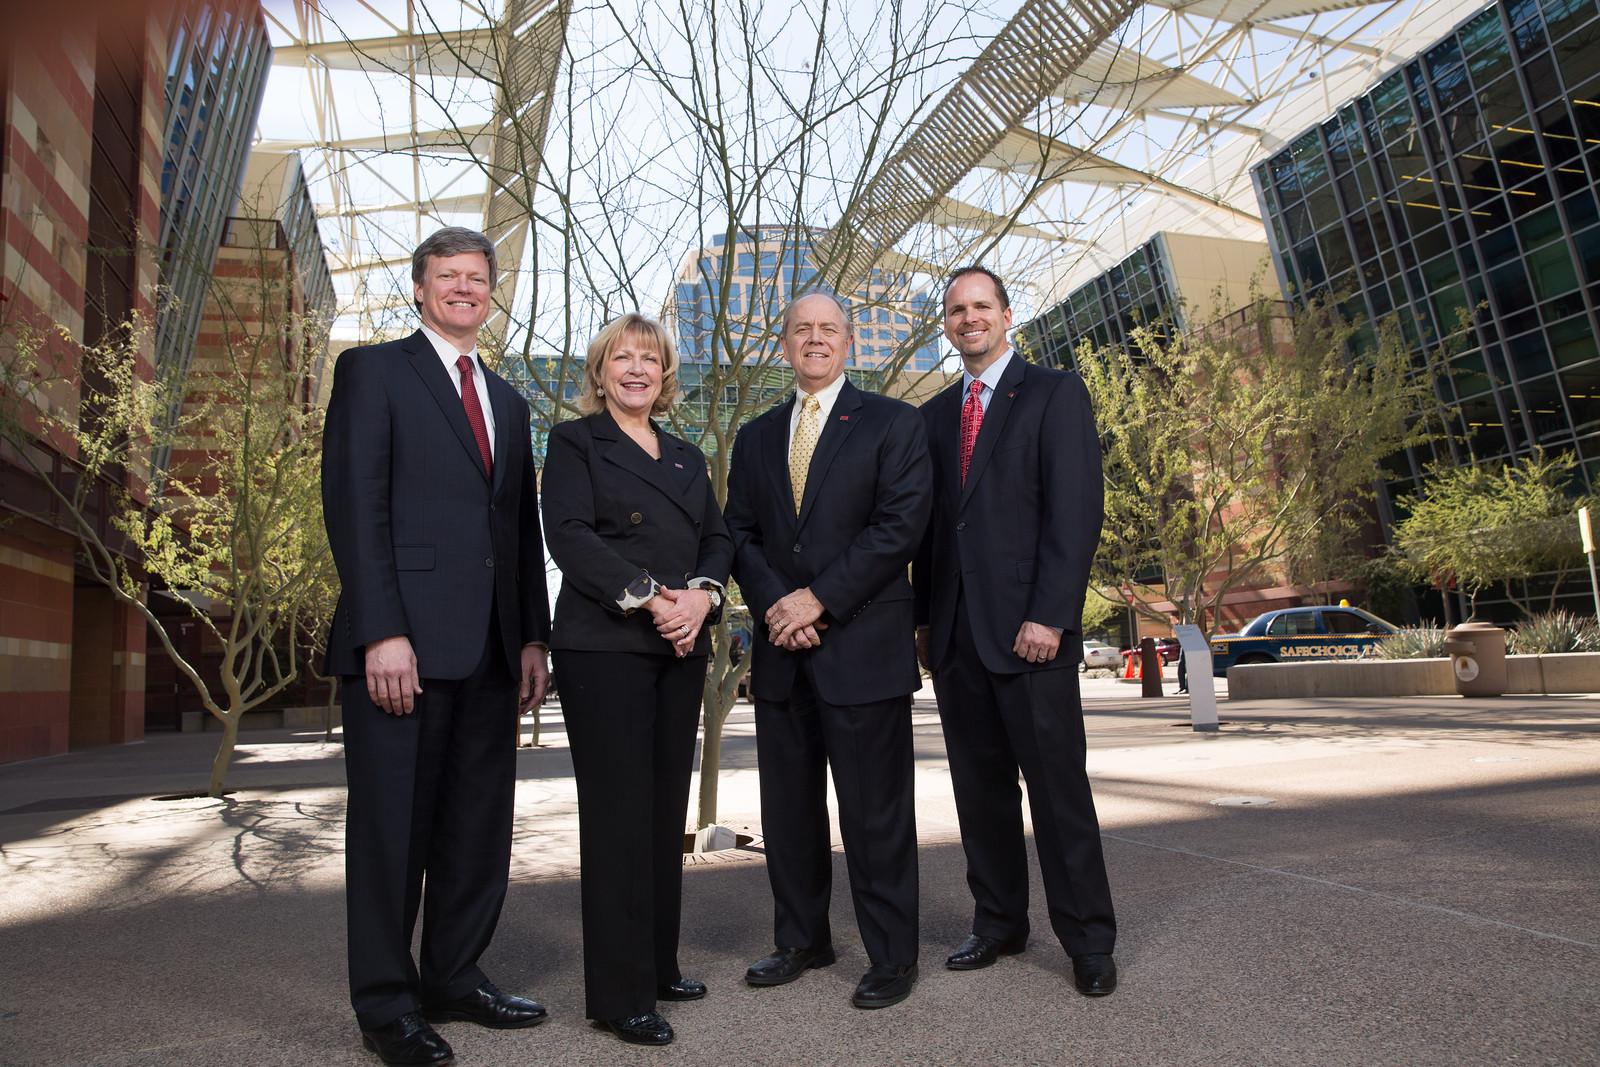 Corporate executive portraits, Phoenix Convention Center